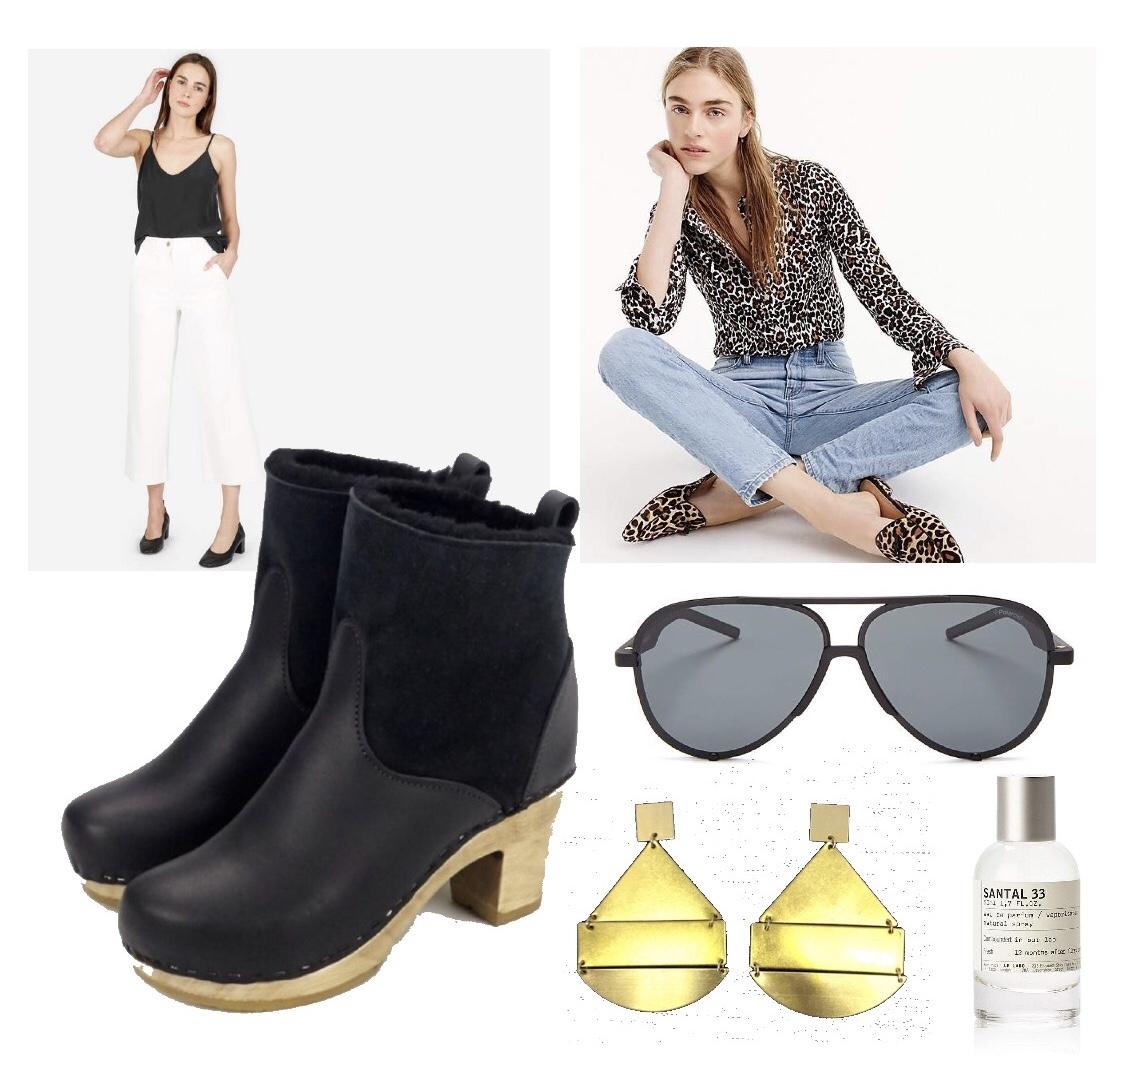 Everlane silk cami ,  J. Crew Perfect Shirt ,  No. 6 shearling boots ,  Polaroid aviators ,  The Only Trybe earrings ,  Santal 33 perfume .